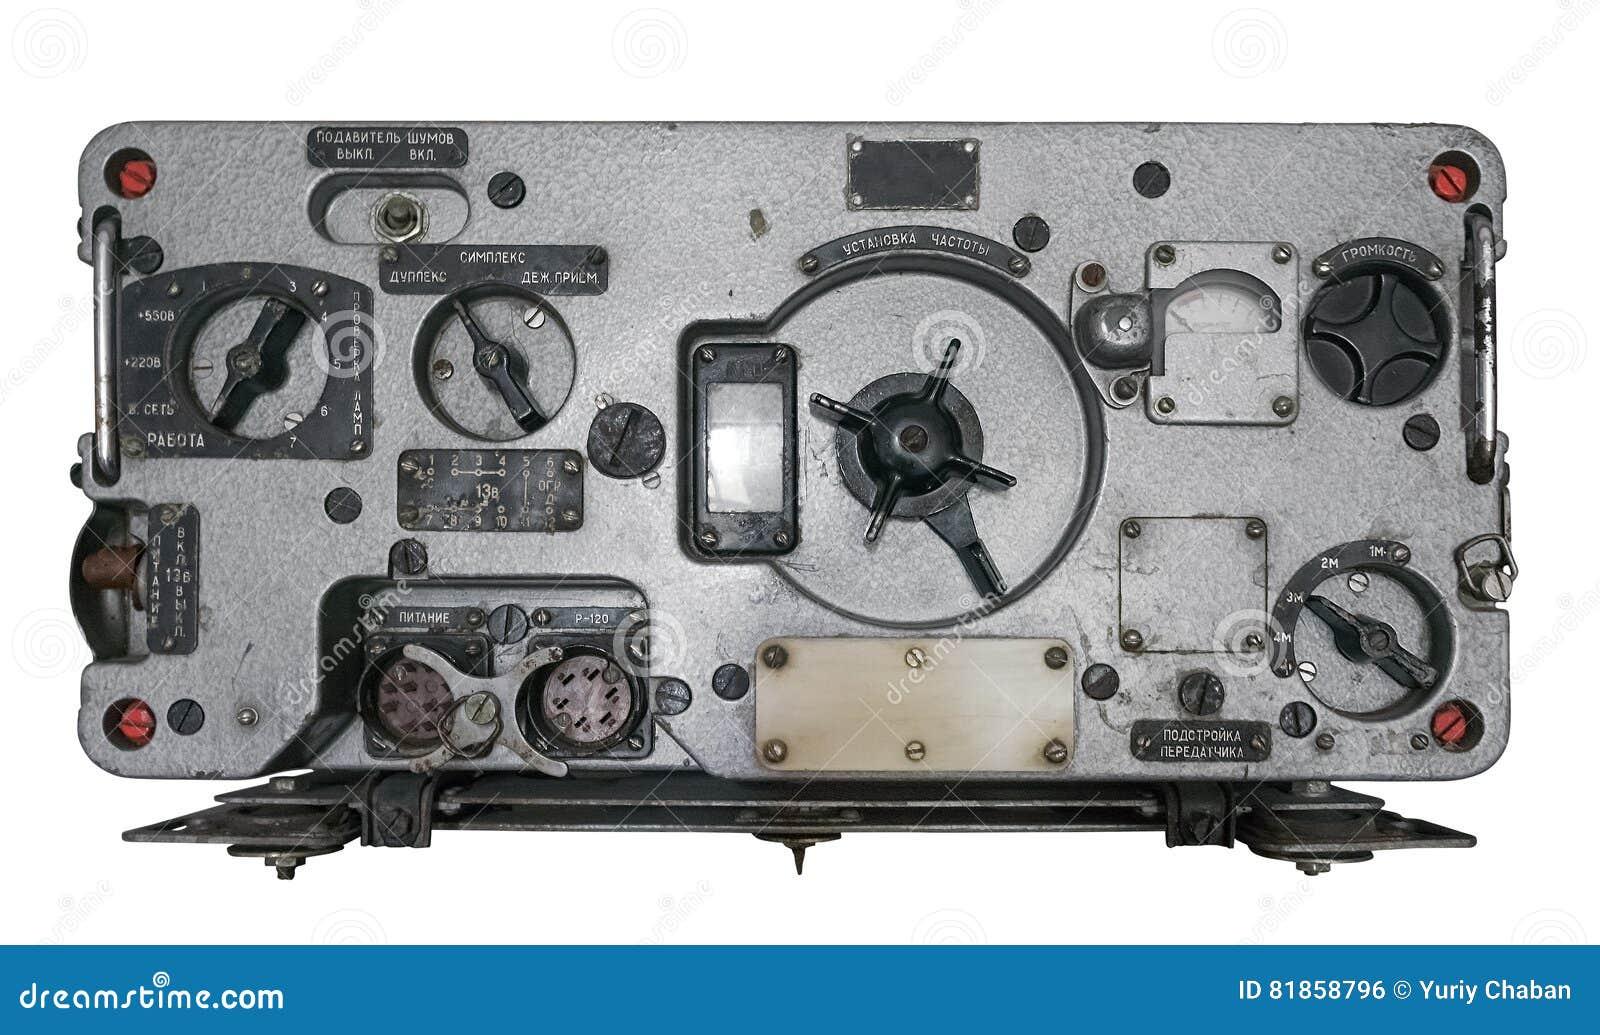 old-soviet-military-radio-reciever-isola